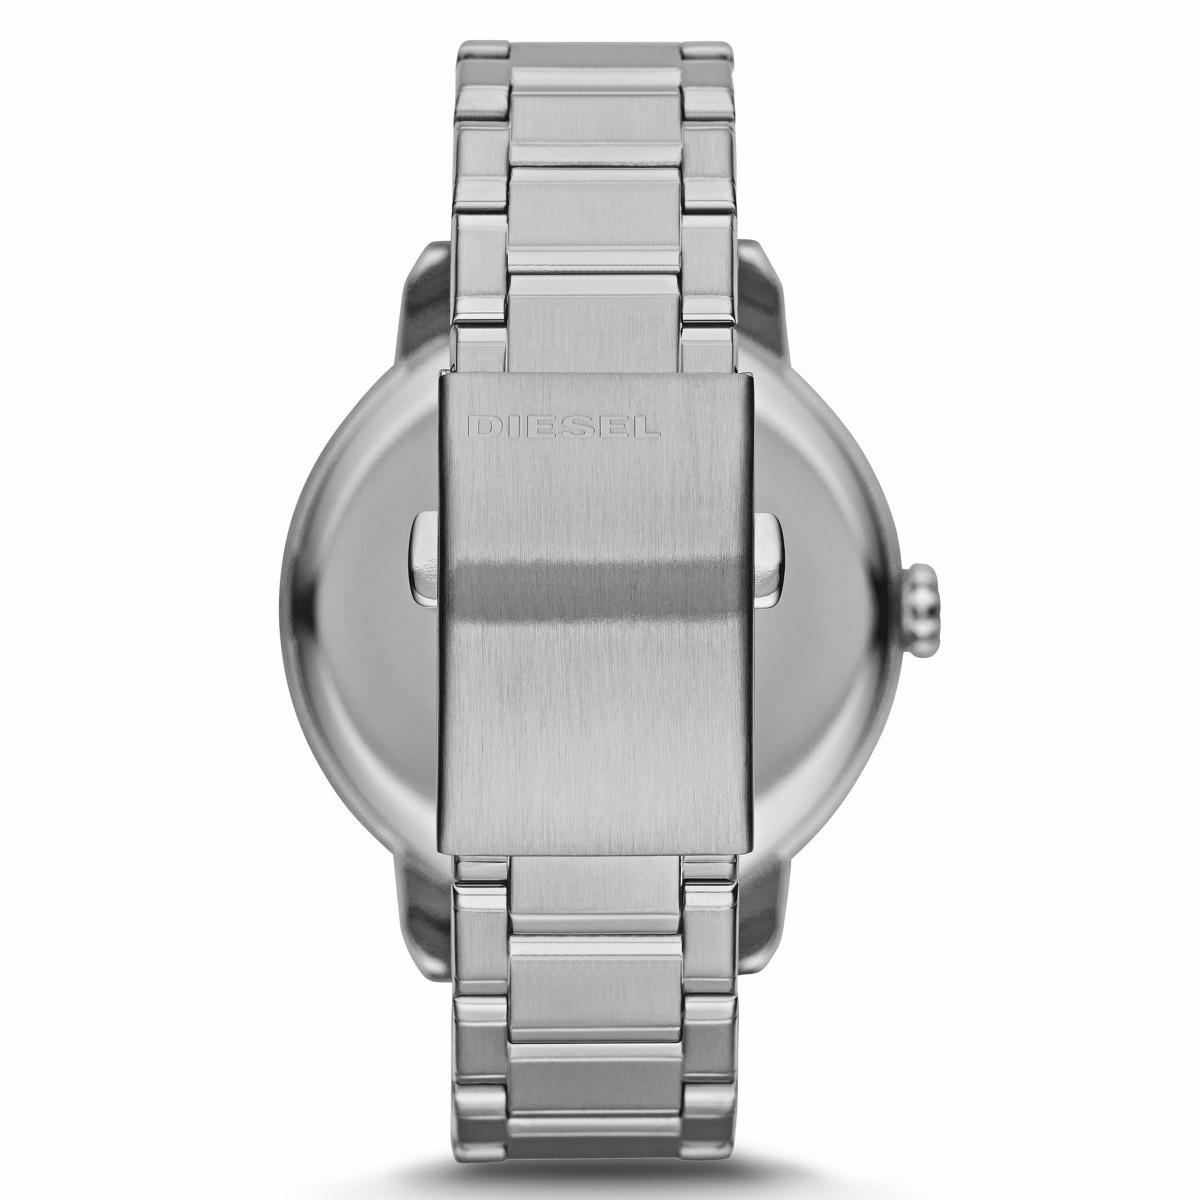 9db9beaa569 Carregando zoom... relógio diesel feminino prata c  detalhes dourado ...